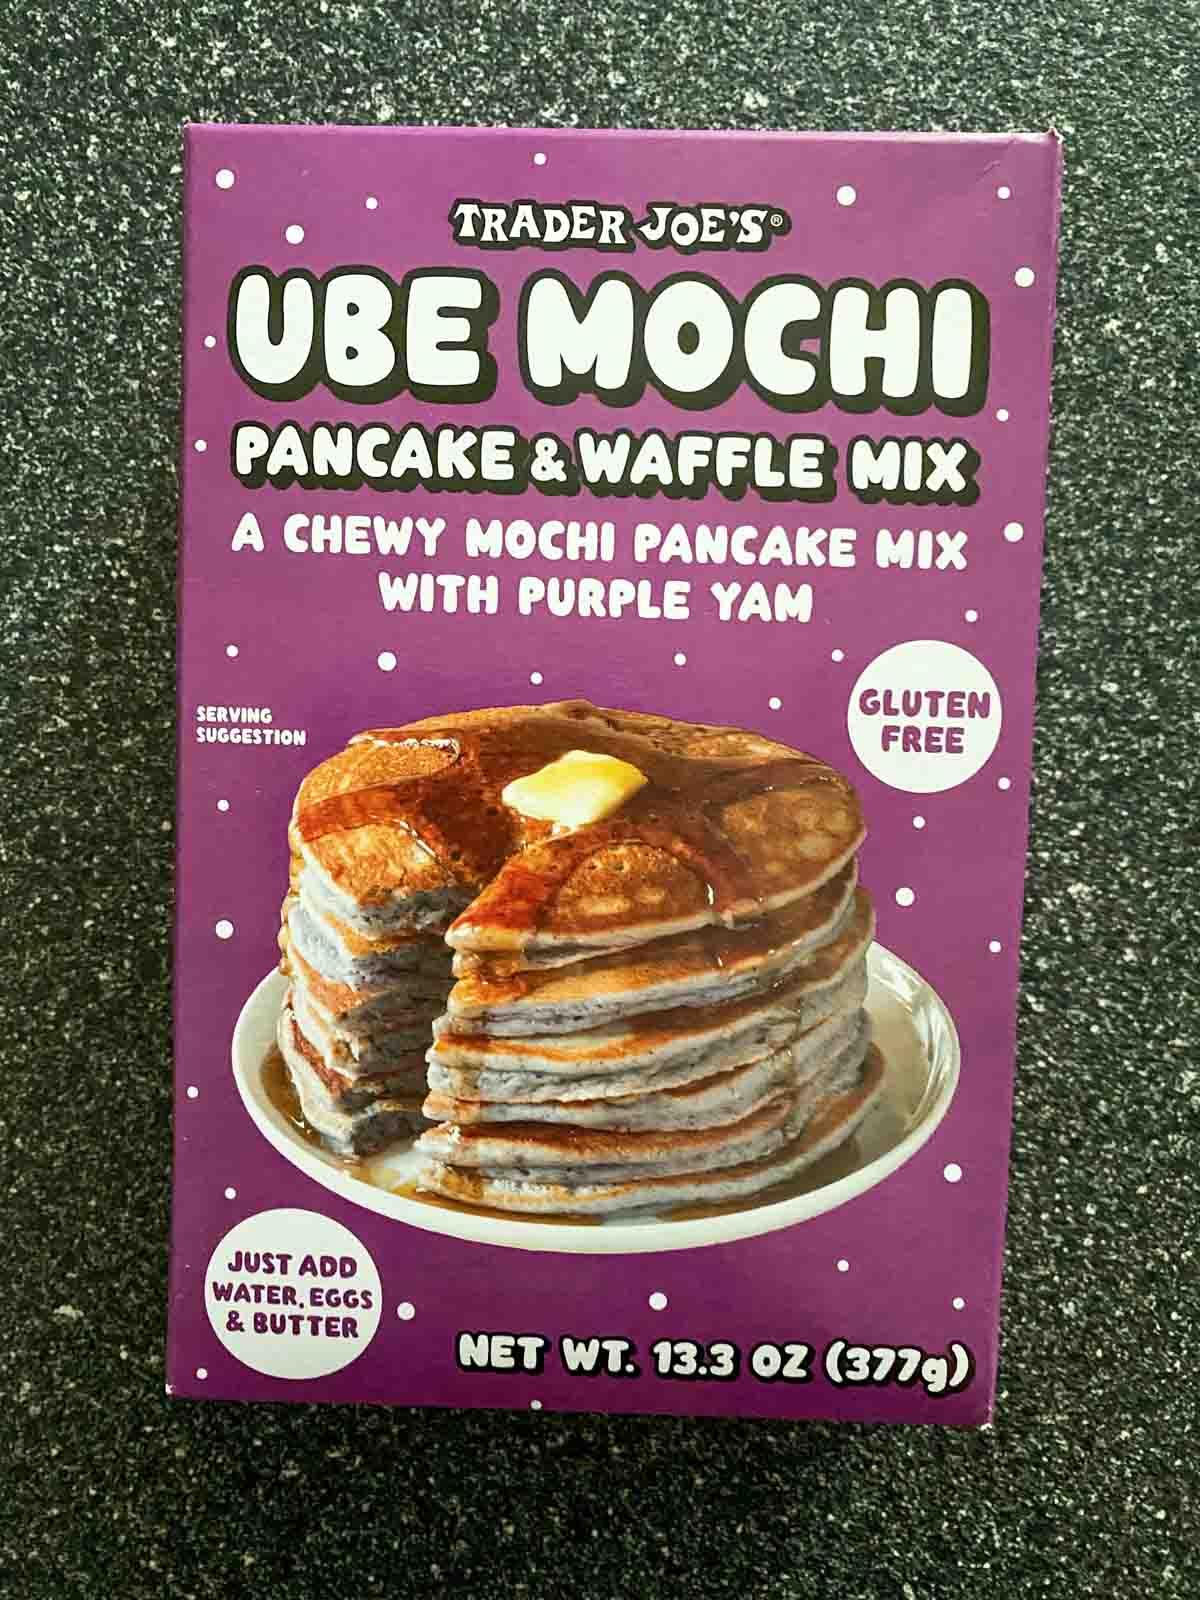 Ube Mochi pancake and waffle mix from Trader Joe's front of box